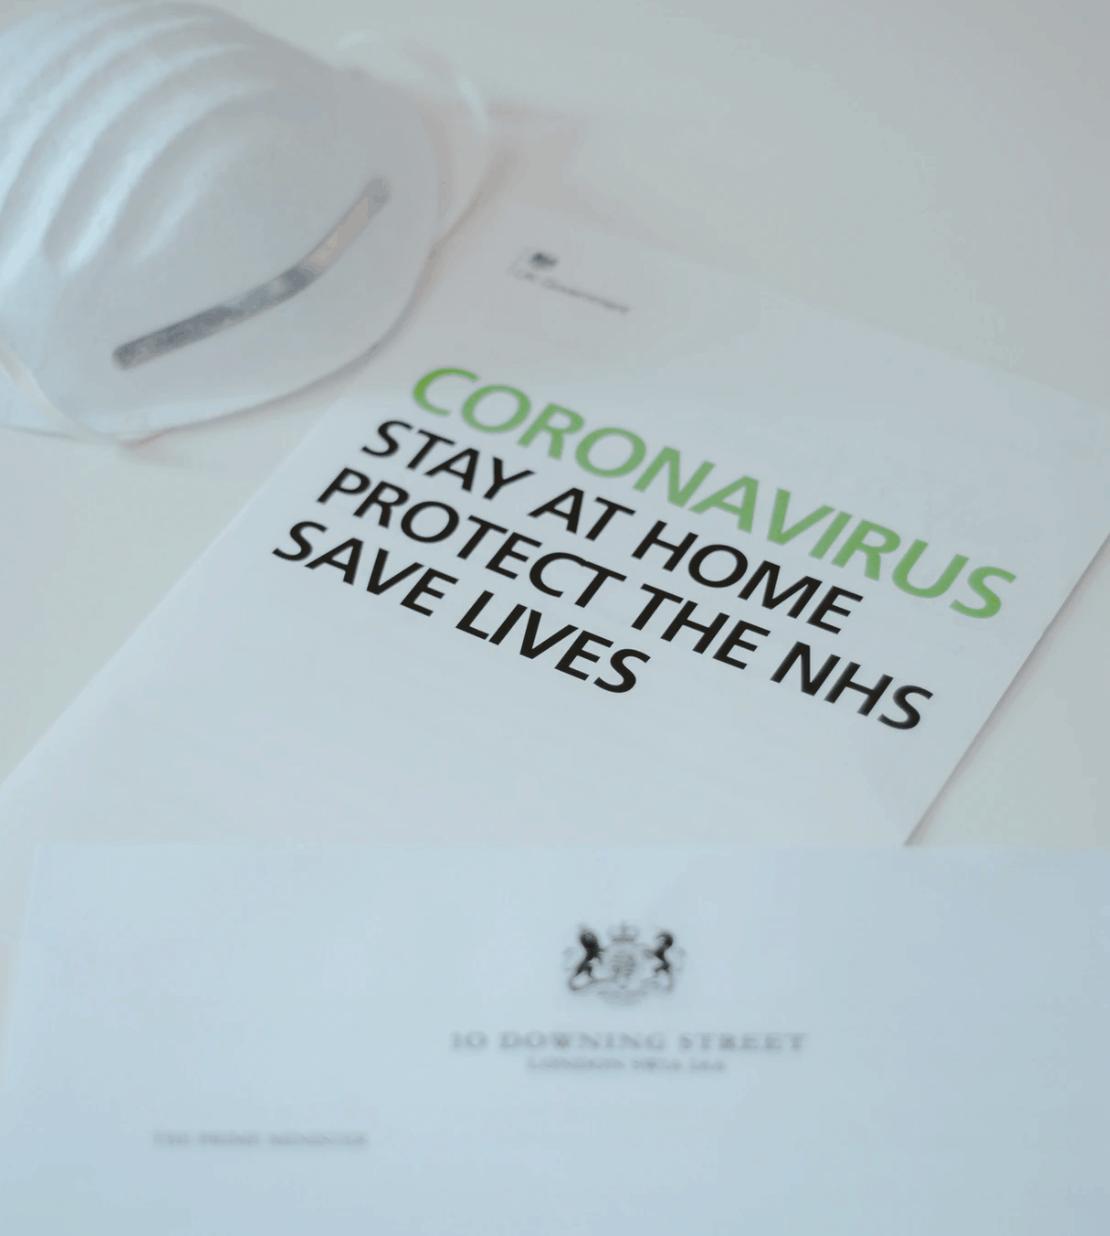 Coronavirus pamphlet